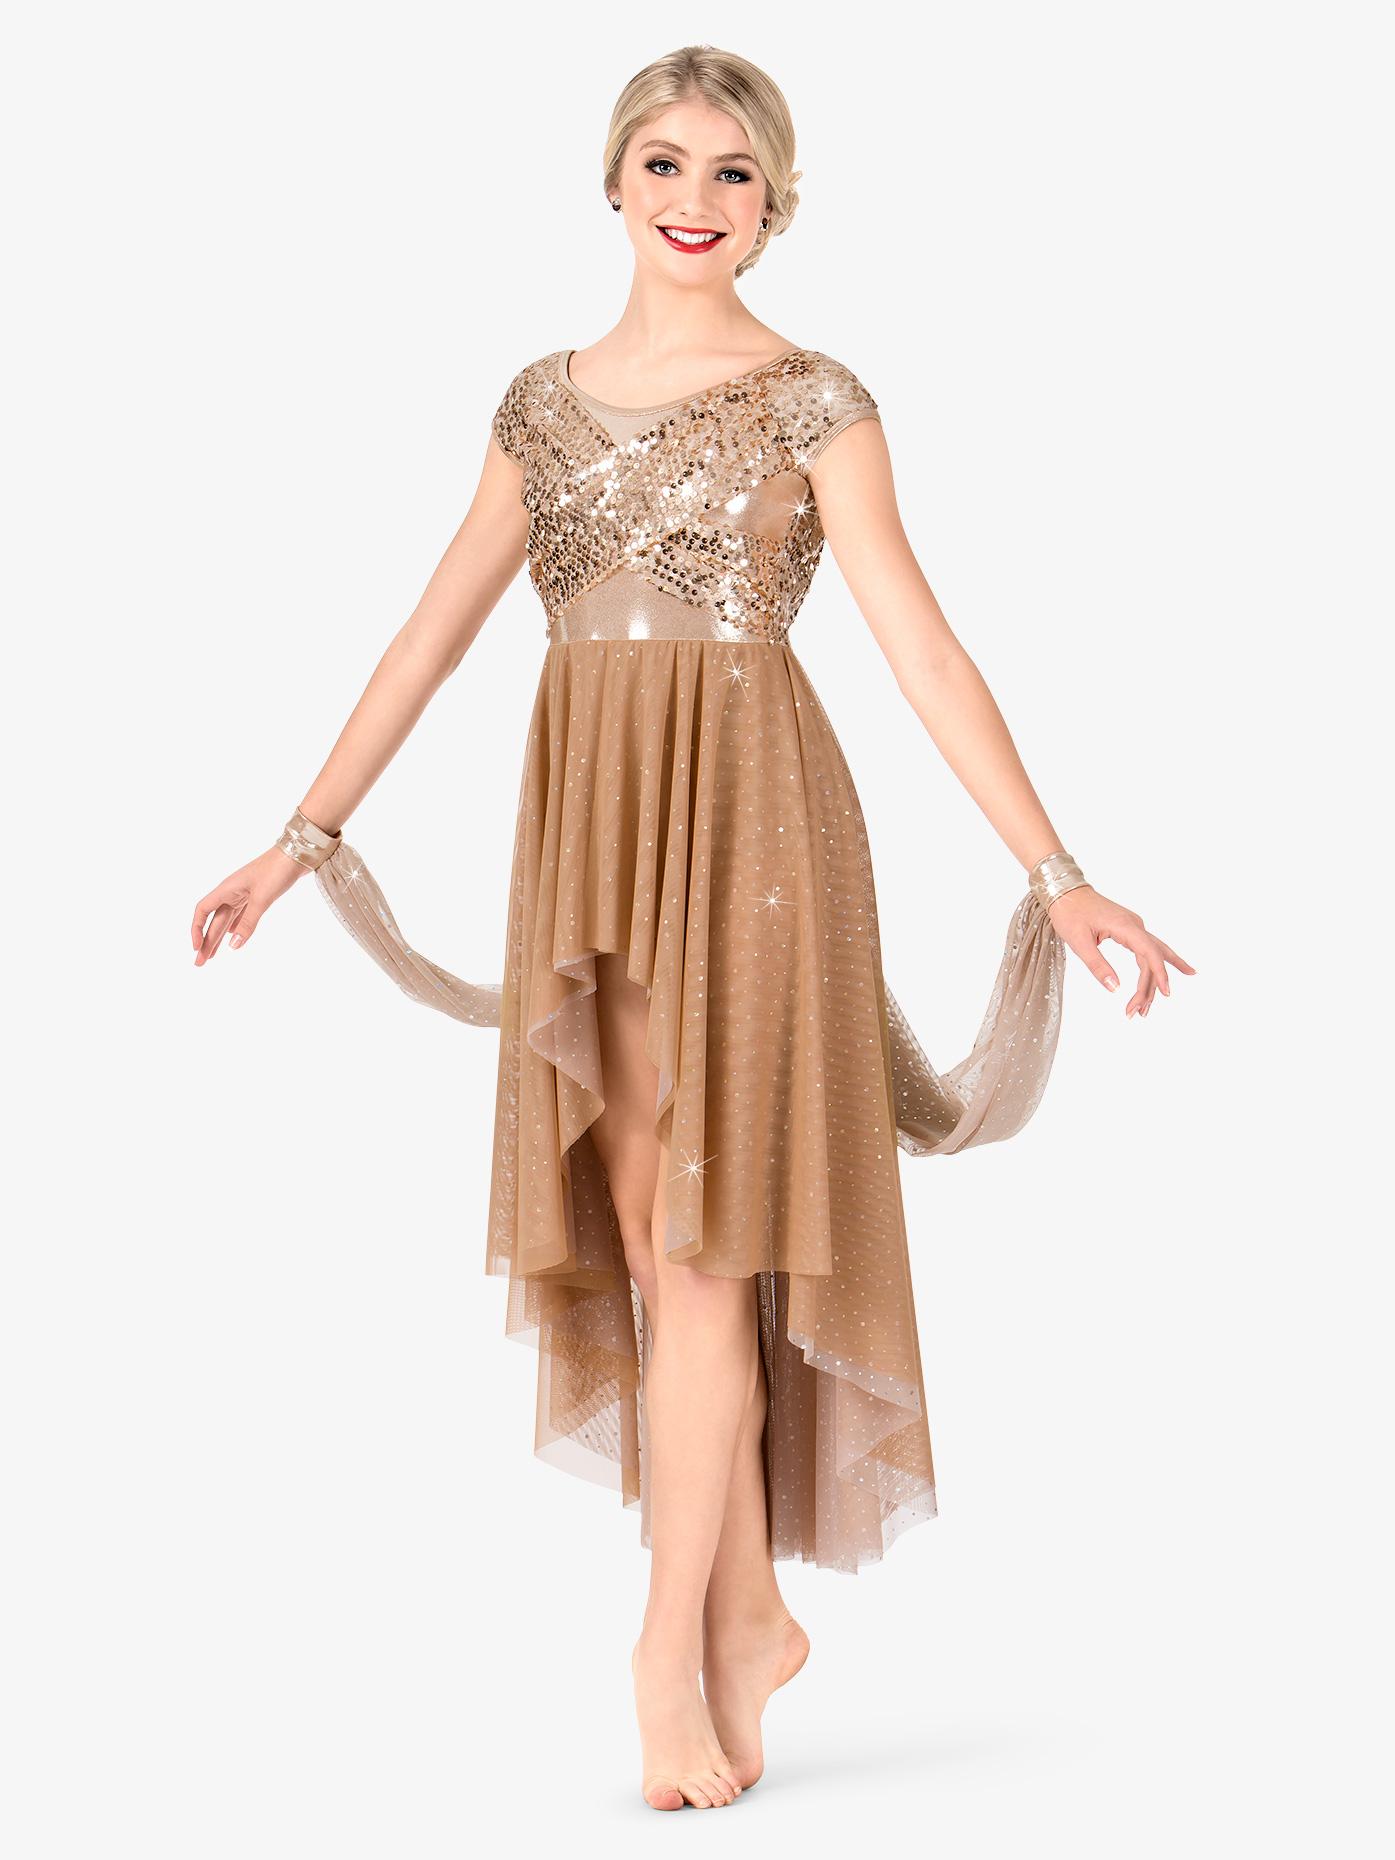 Elisse by Double Platinum Womens Plus Size Sequin High-Low Performance Dress N7474P